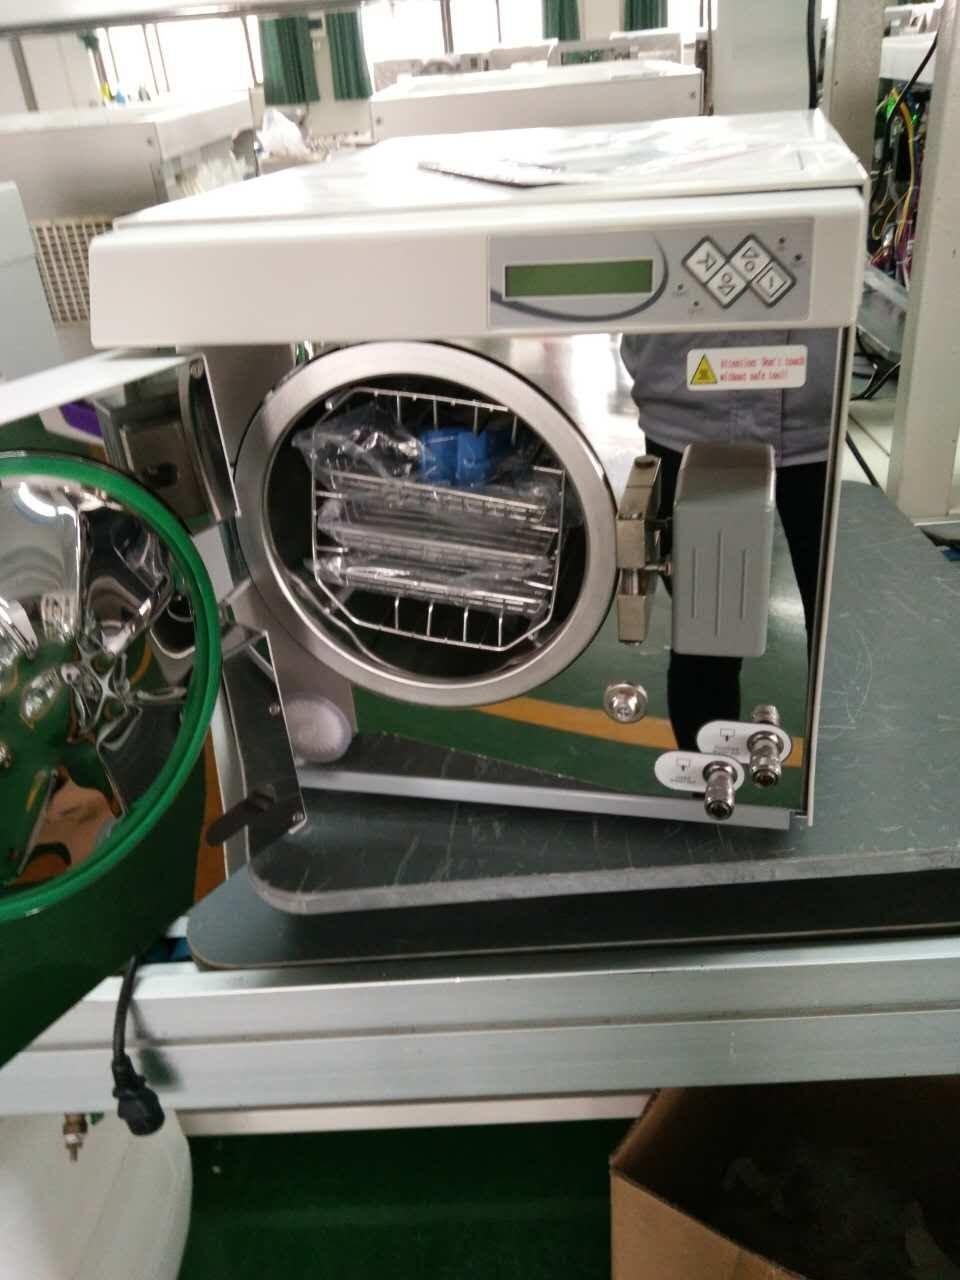 Dental Mini Autoclave - Zeta 8L New Sterilizer Medical Vacuum with LCD Screen Class B by Zeta